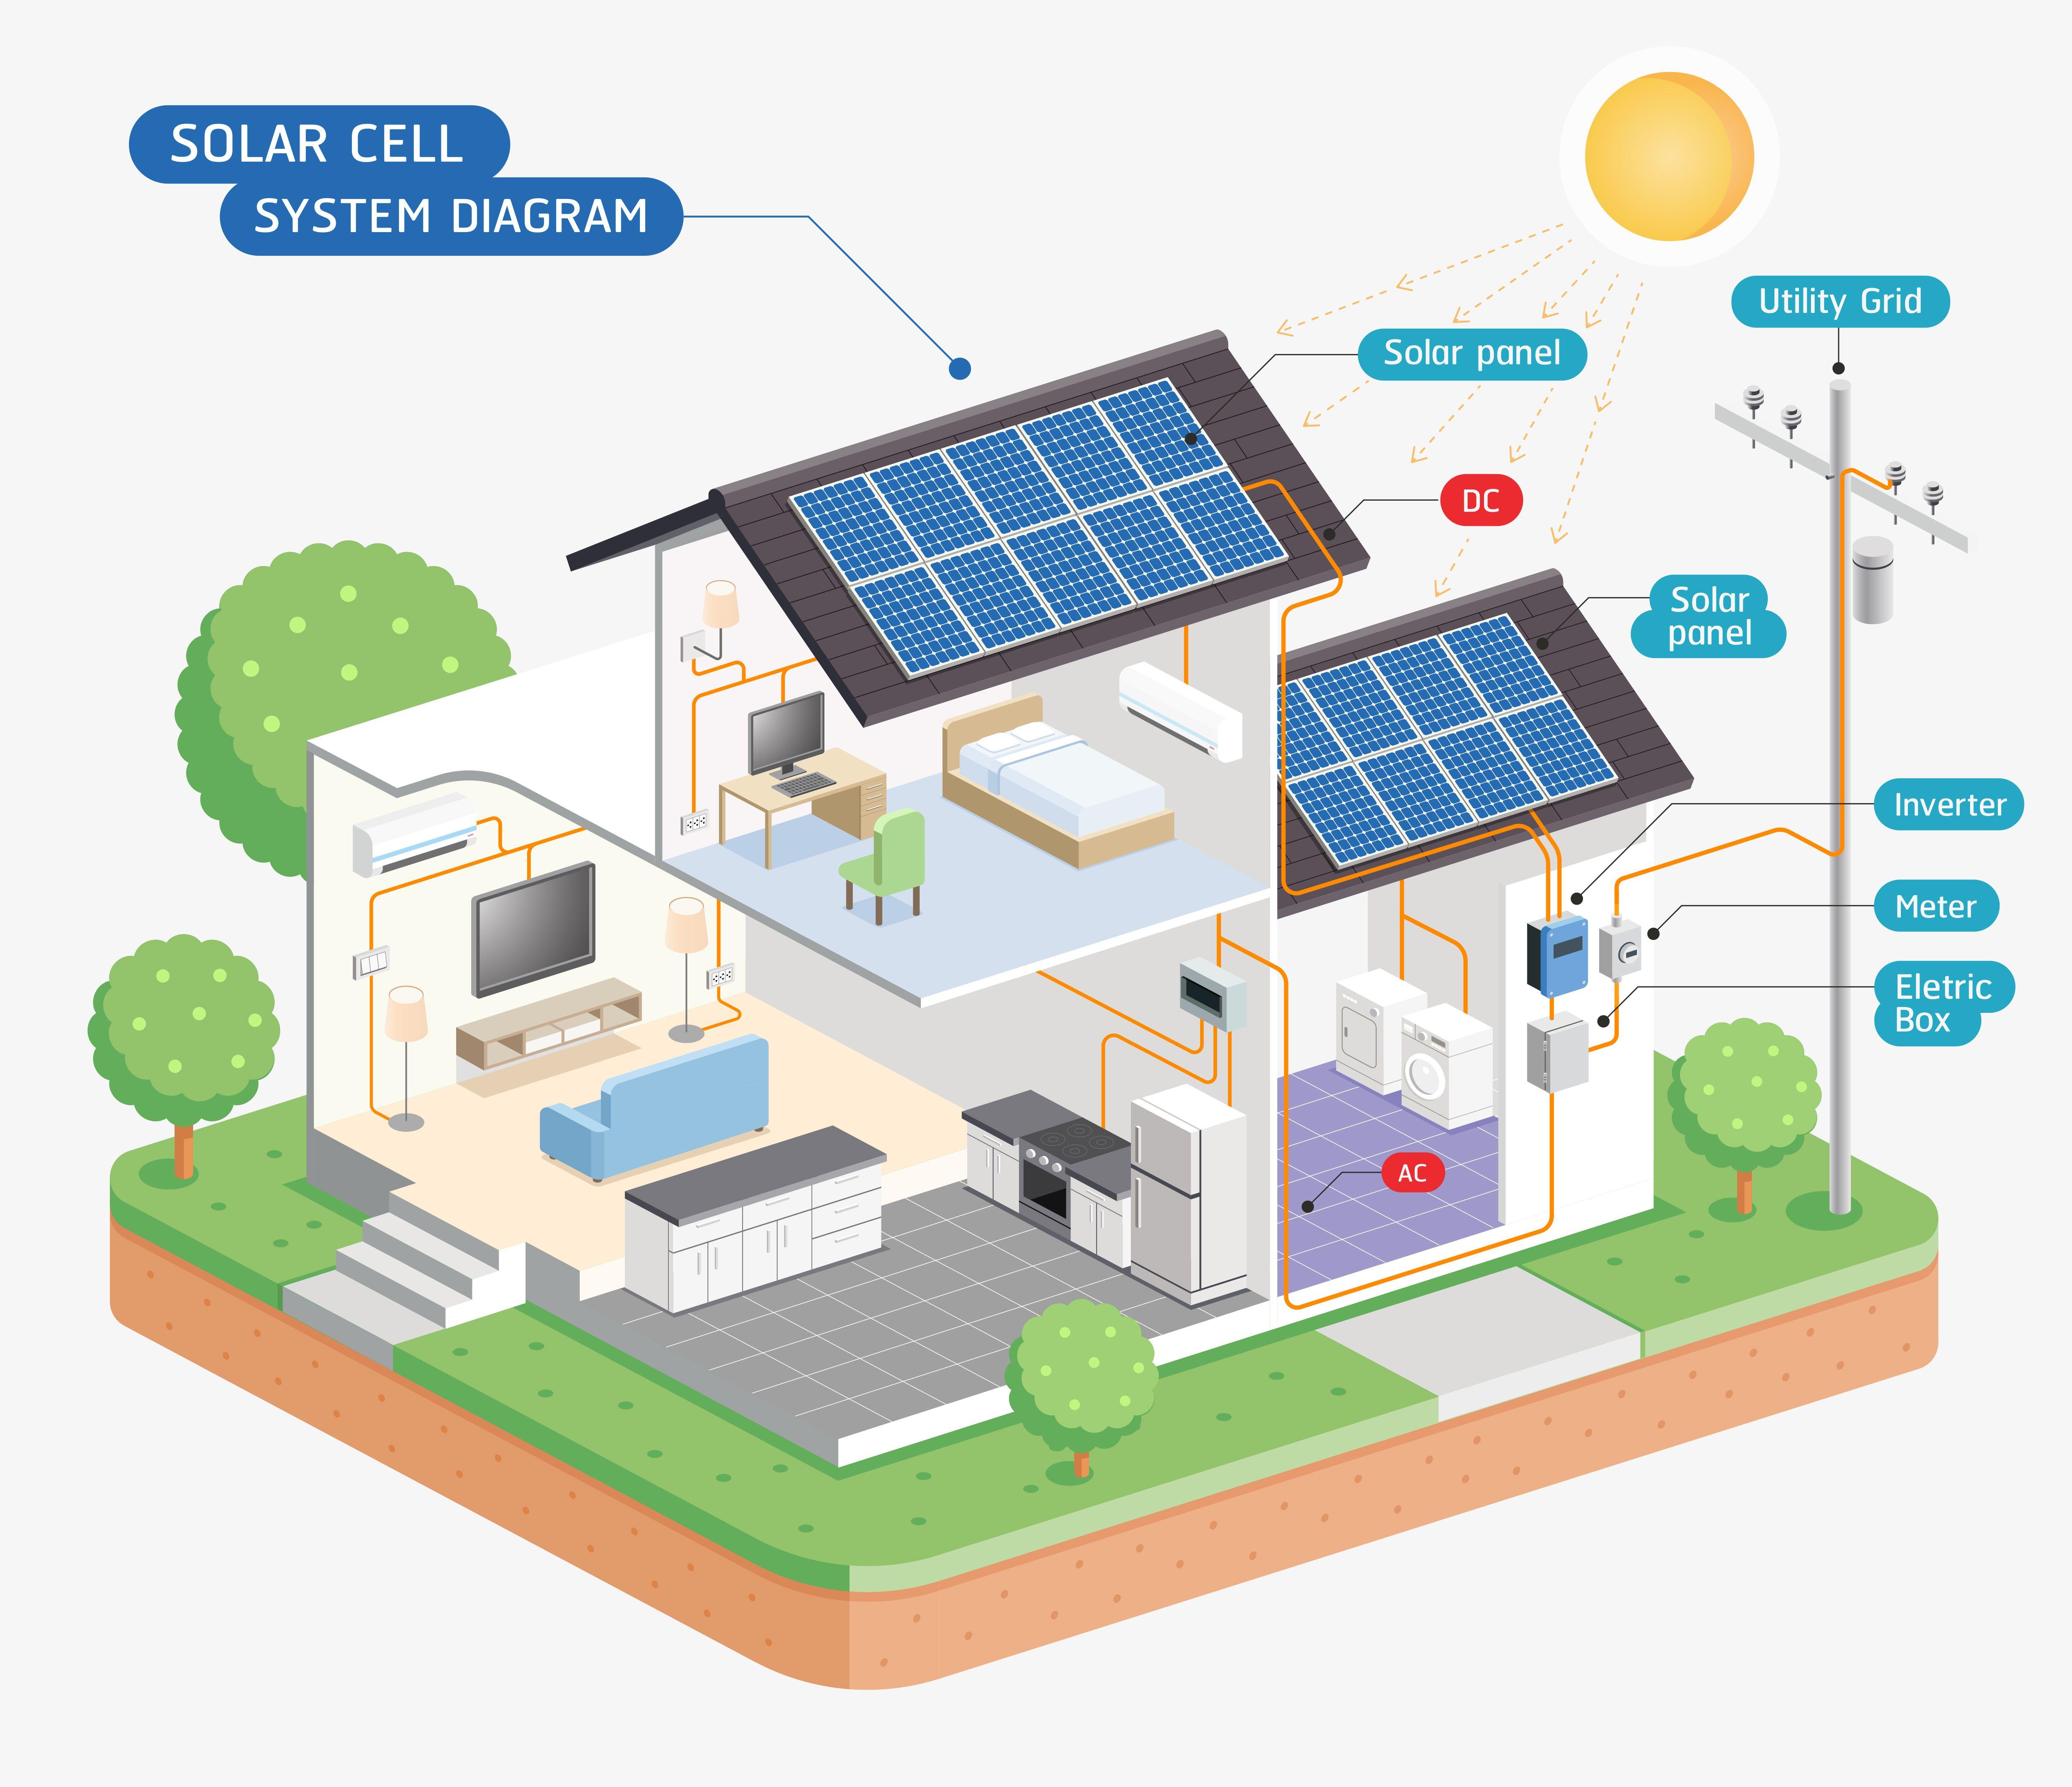 Paneles Solares Para Casas Y Pequenos Negocios Geonova Sistema De Energia Solar Paneles Solares Instalacion De Paneles Solares